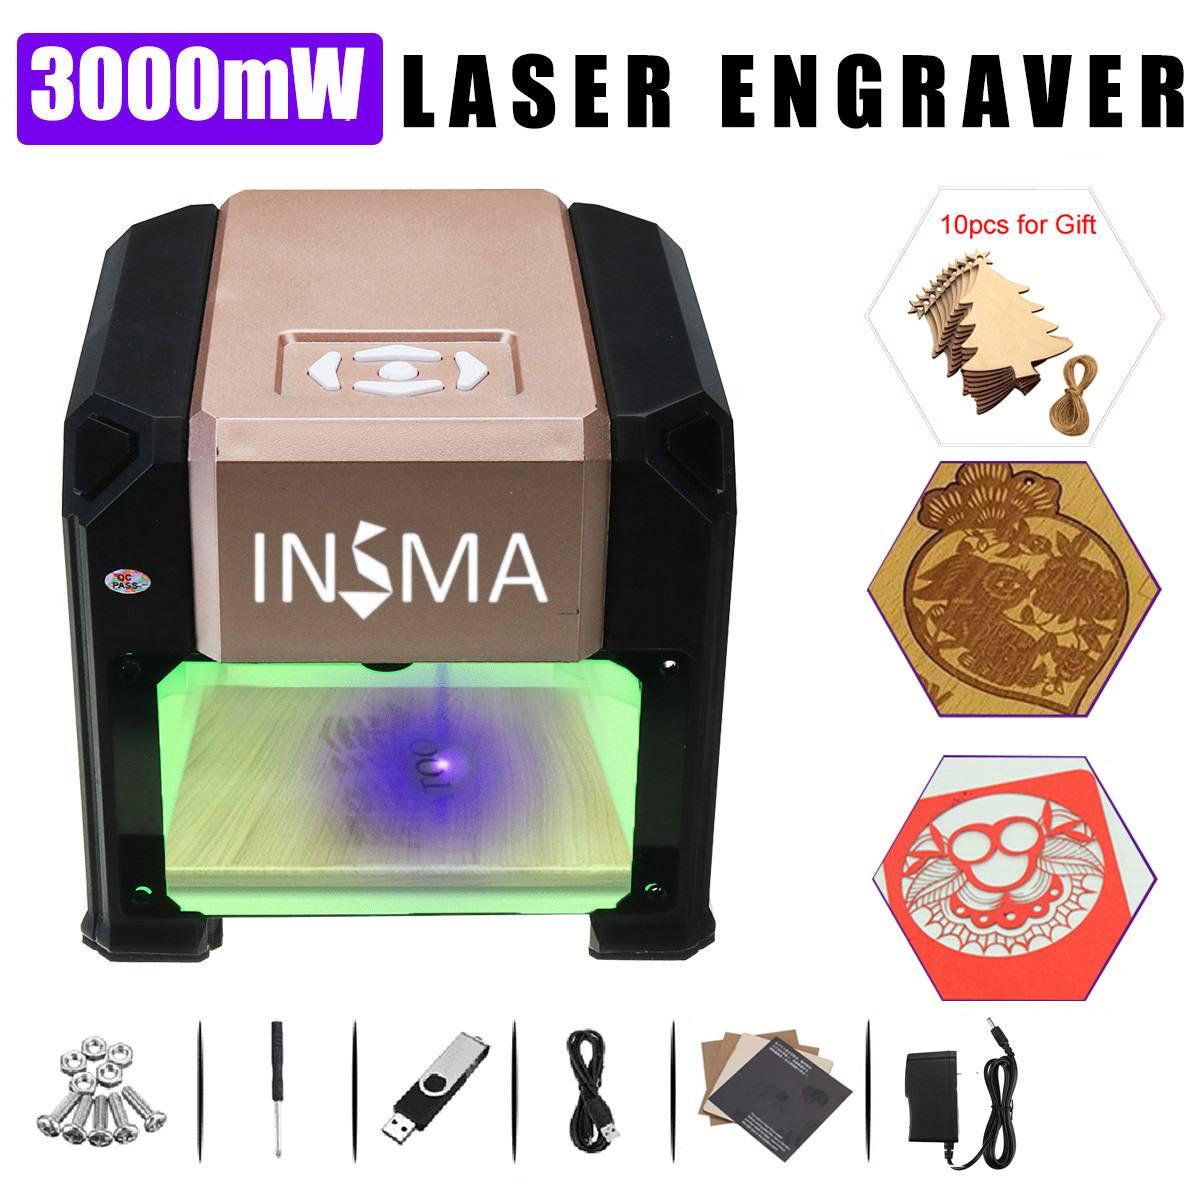 3000 mW CNC Laser Engraver DIY Logo Mark Printer Laser Engraving Carving Machine for FOR Windows for Mac OS System 1